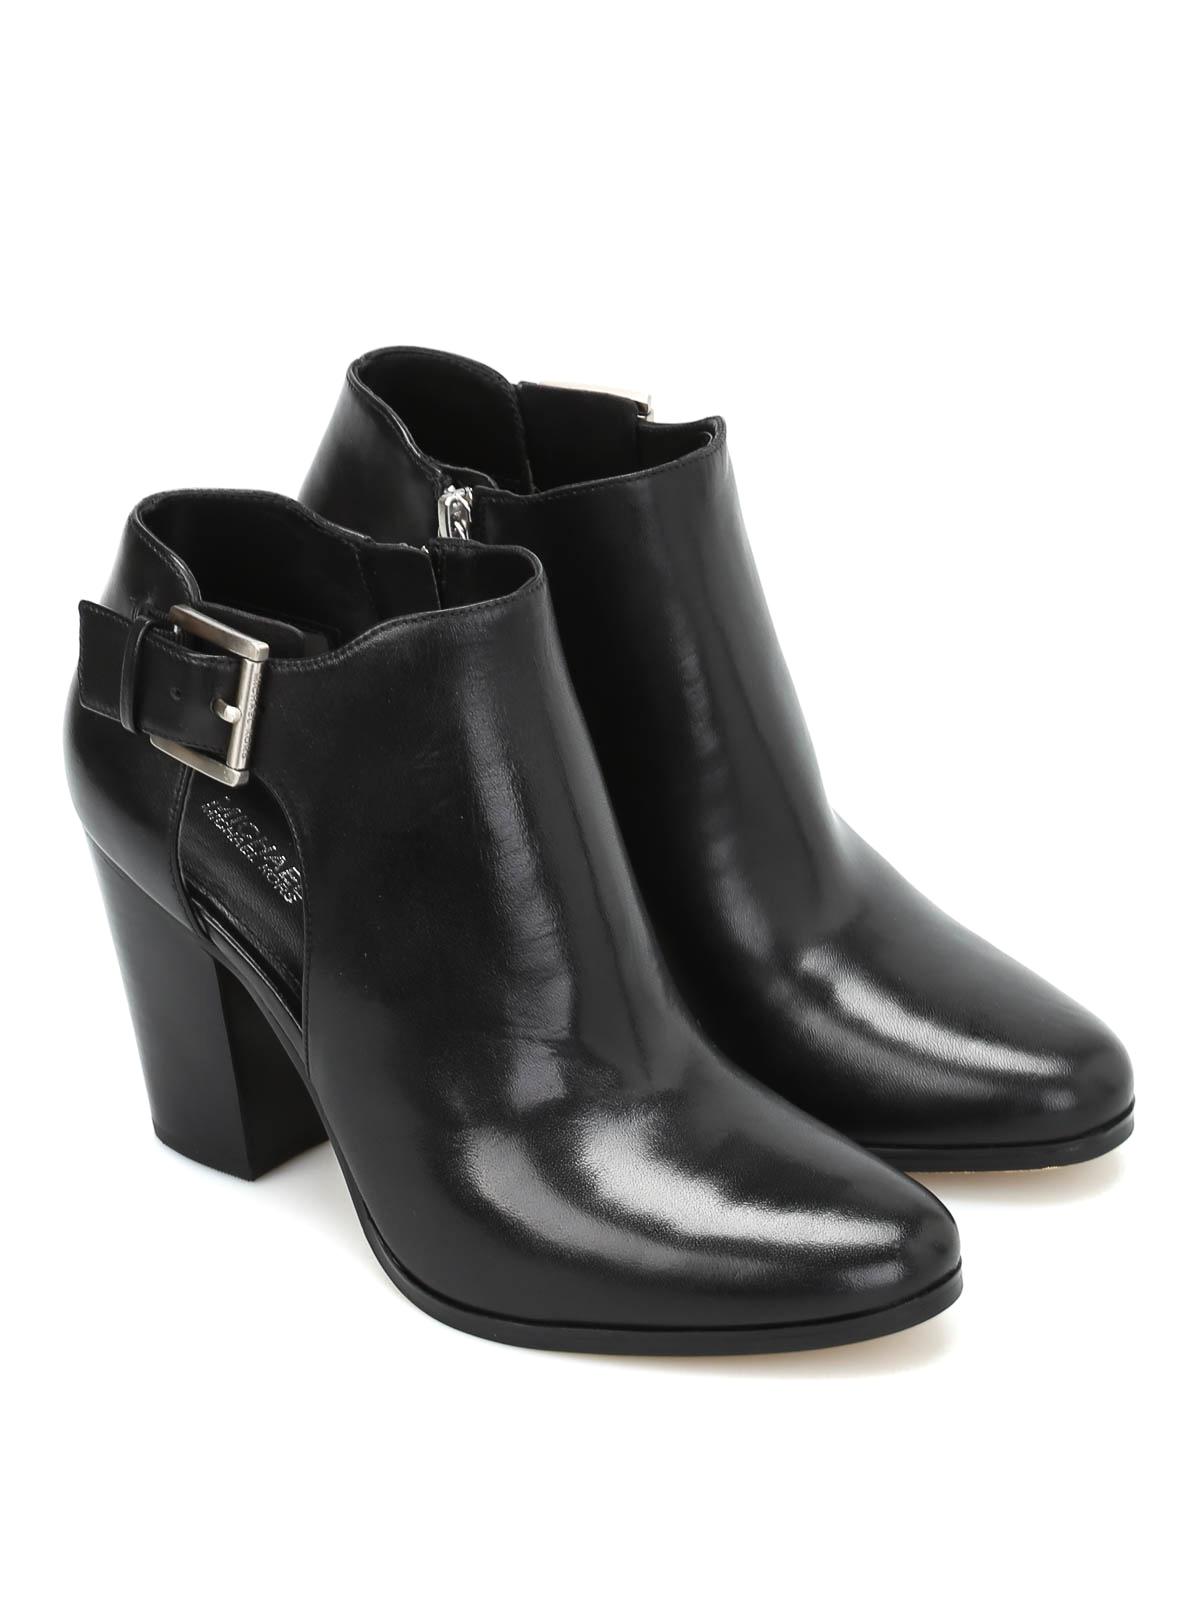 Michael Kors - Adams leather booties